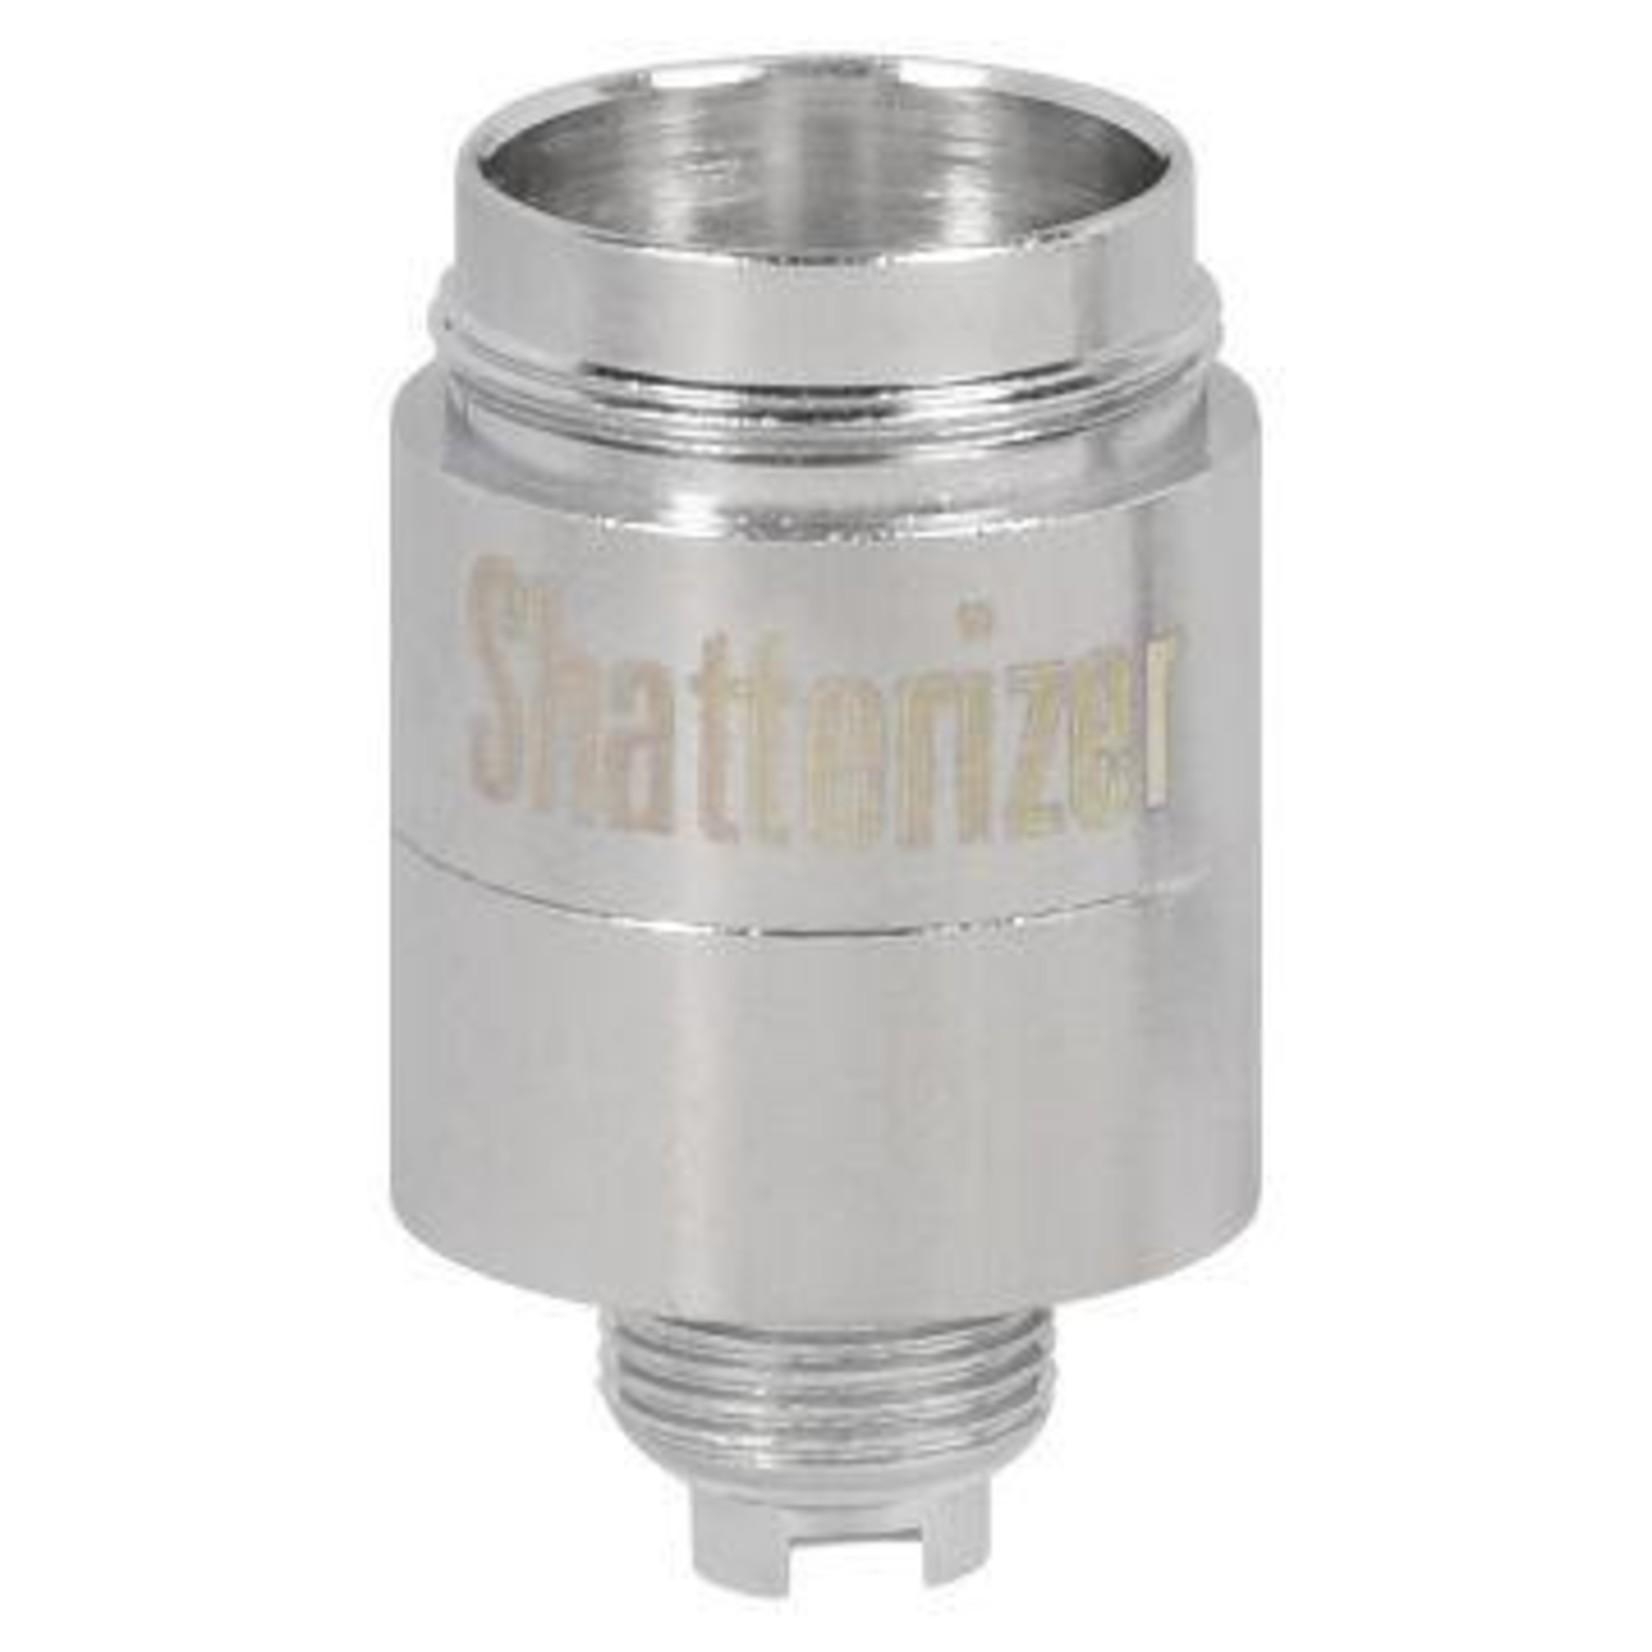 Shatterizer SHATTERIZER CERAMIC CTECH COIL(1)